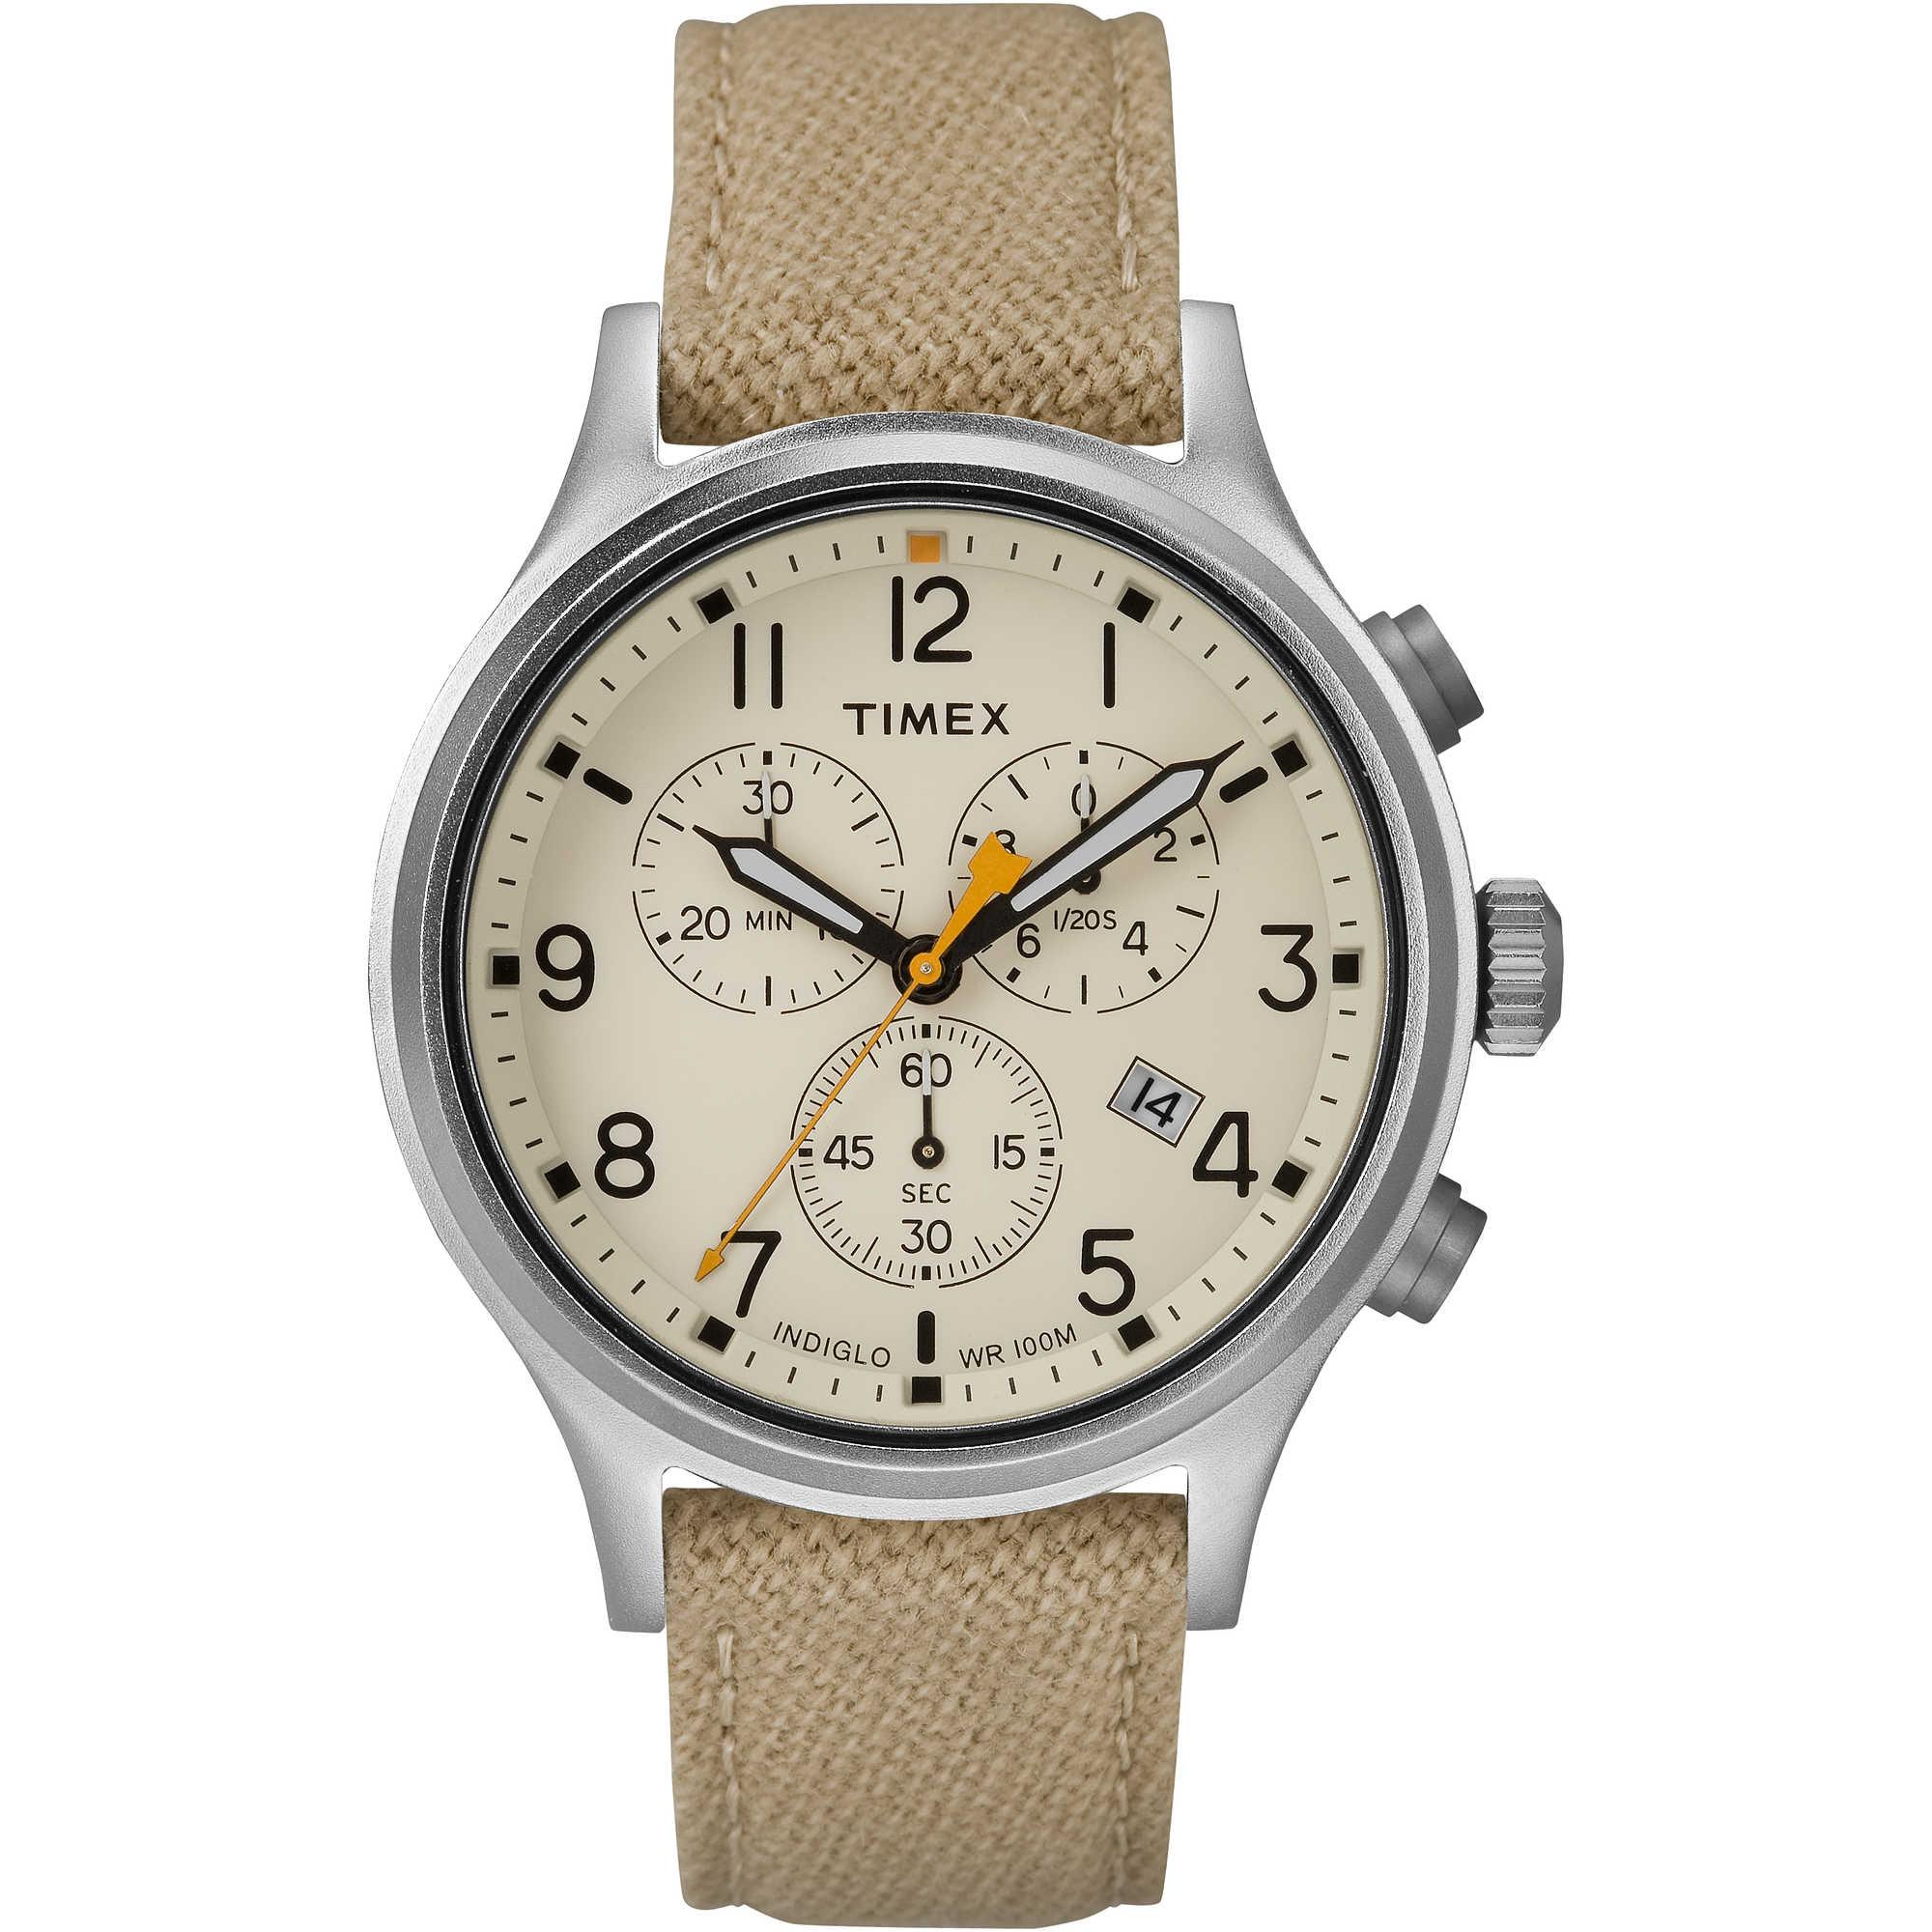 6c07bbd857c3 orologio cronografo uomo Timex Allied TW2R47300 orologio cronografo uomo  Timex Allied TW2R47300